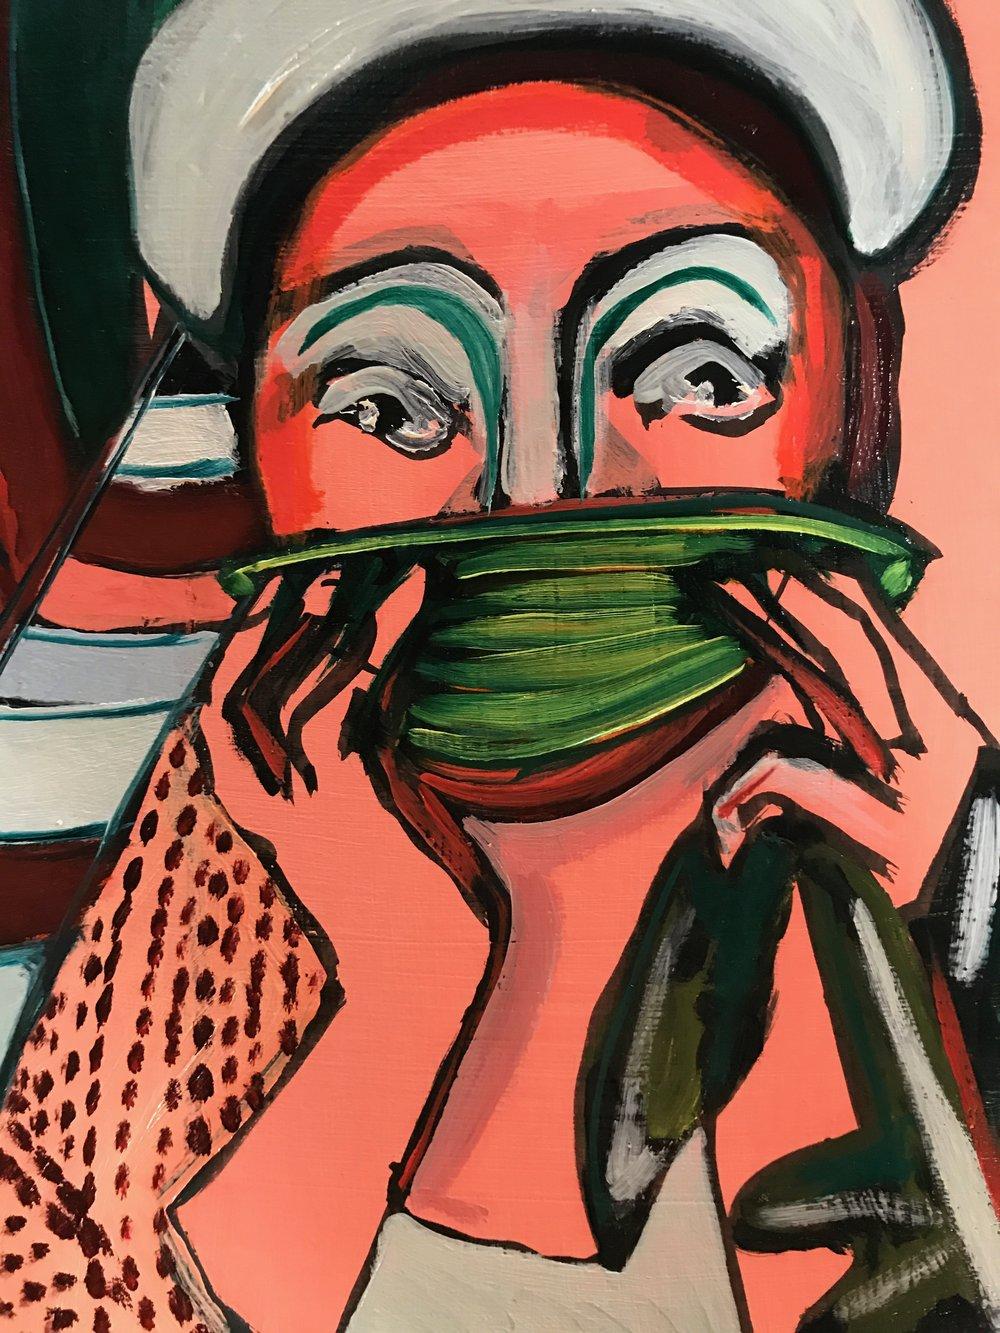 Green Rind Green Rag (2018)